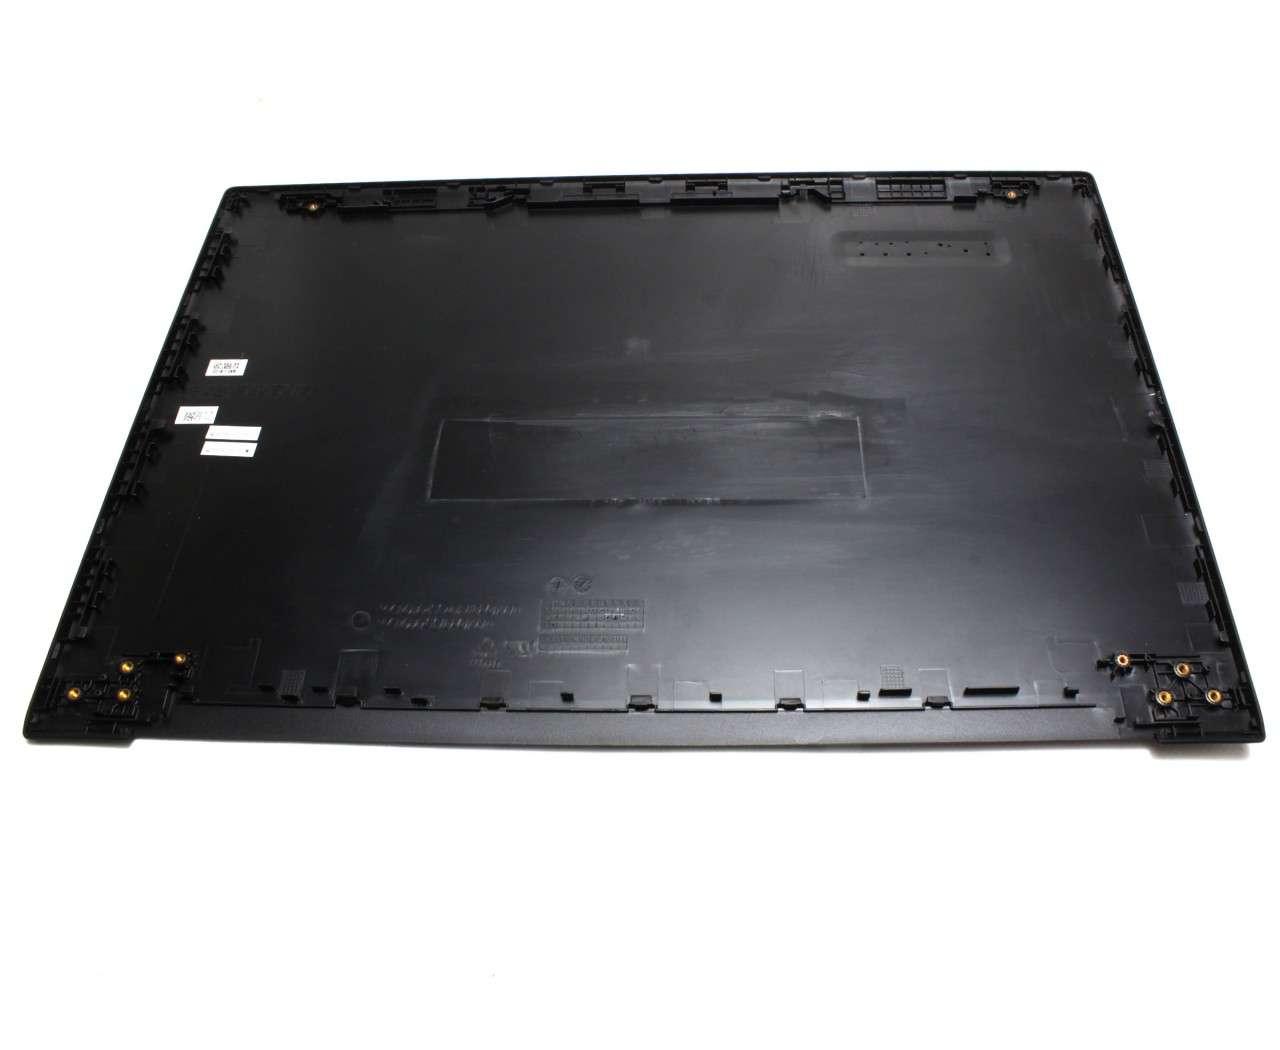 Capac Display BackCover Lenovo V510-15ikb Carcasa Display imagine powerlaptop.ro 2021